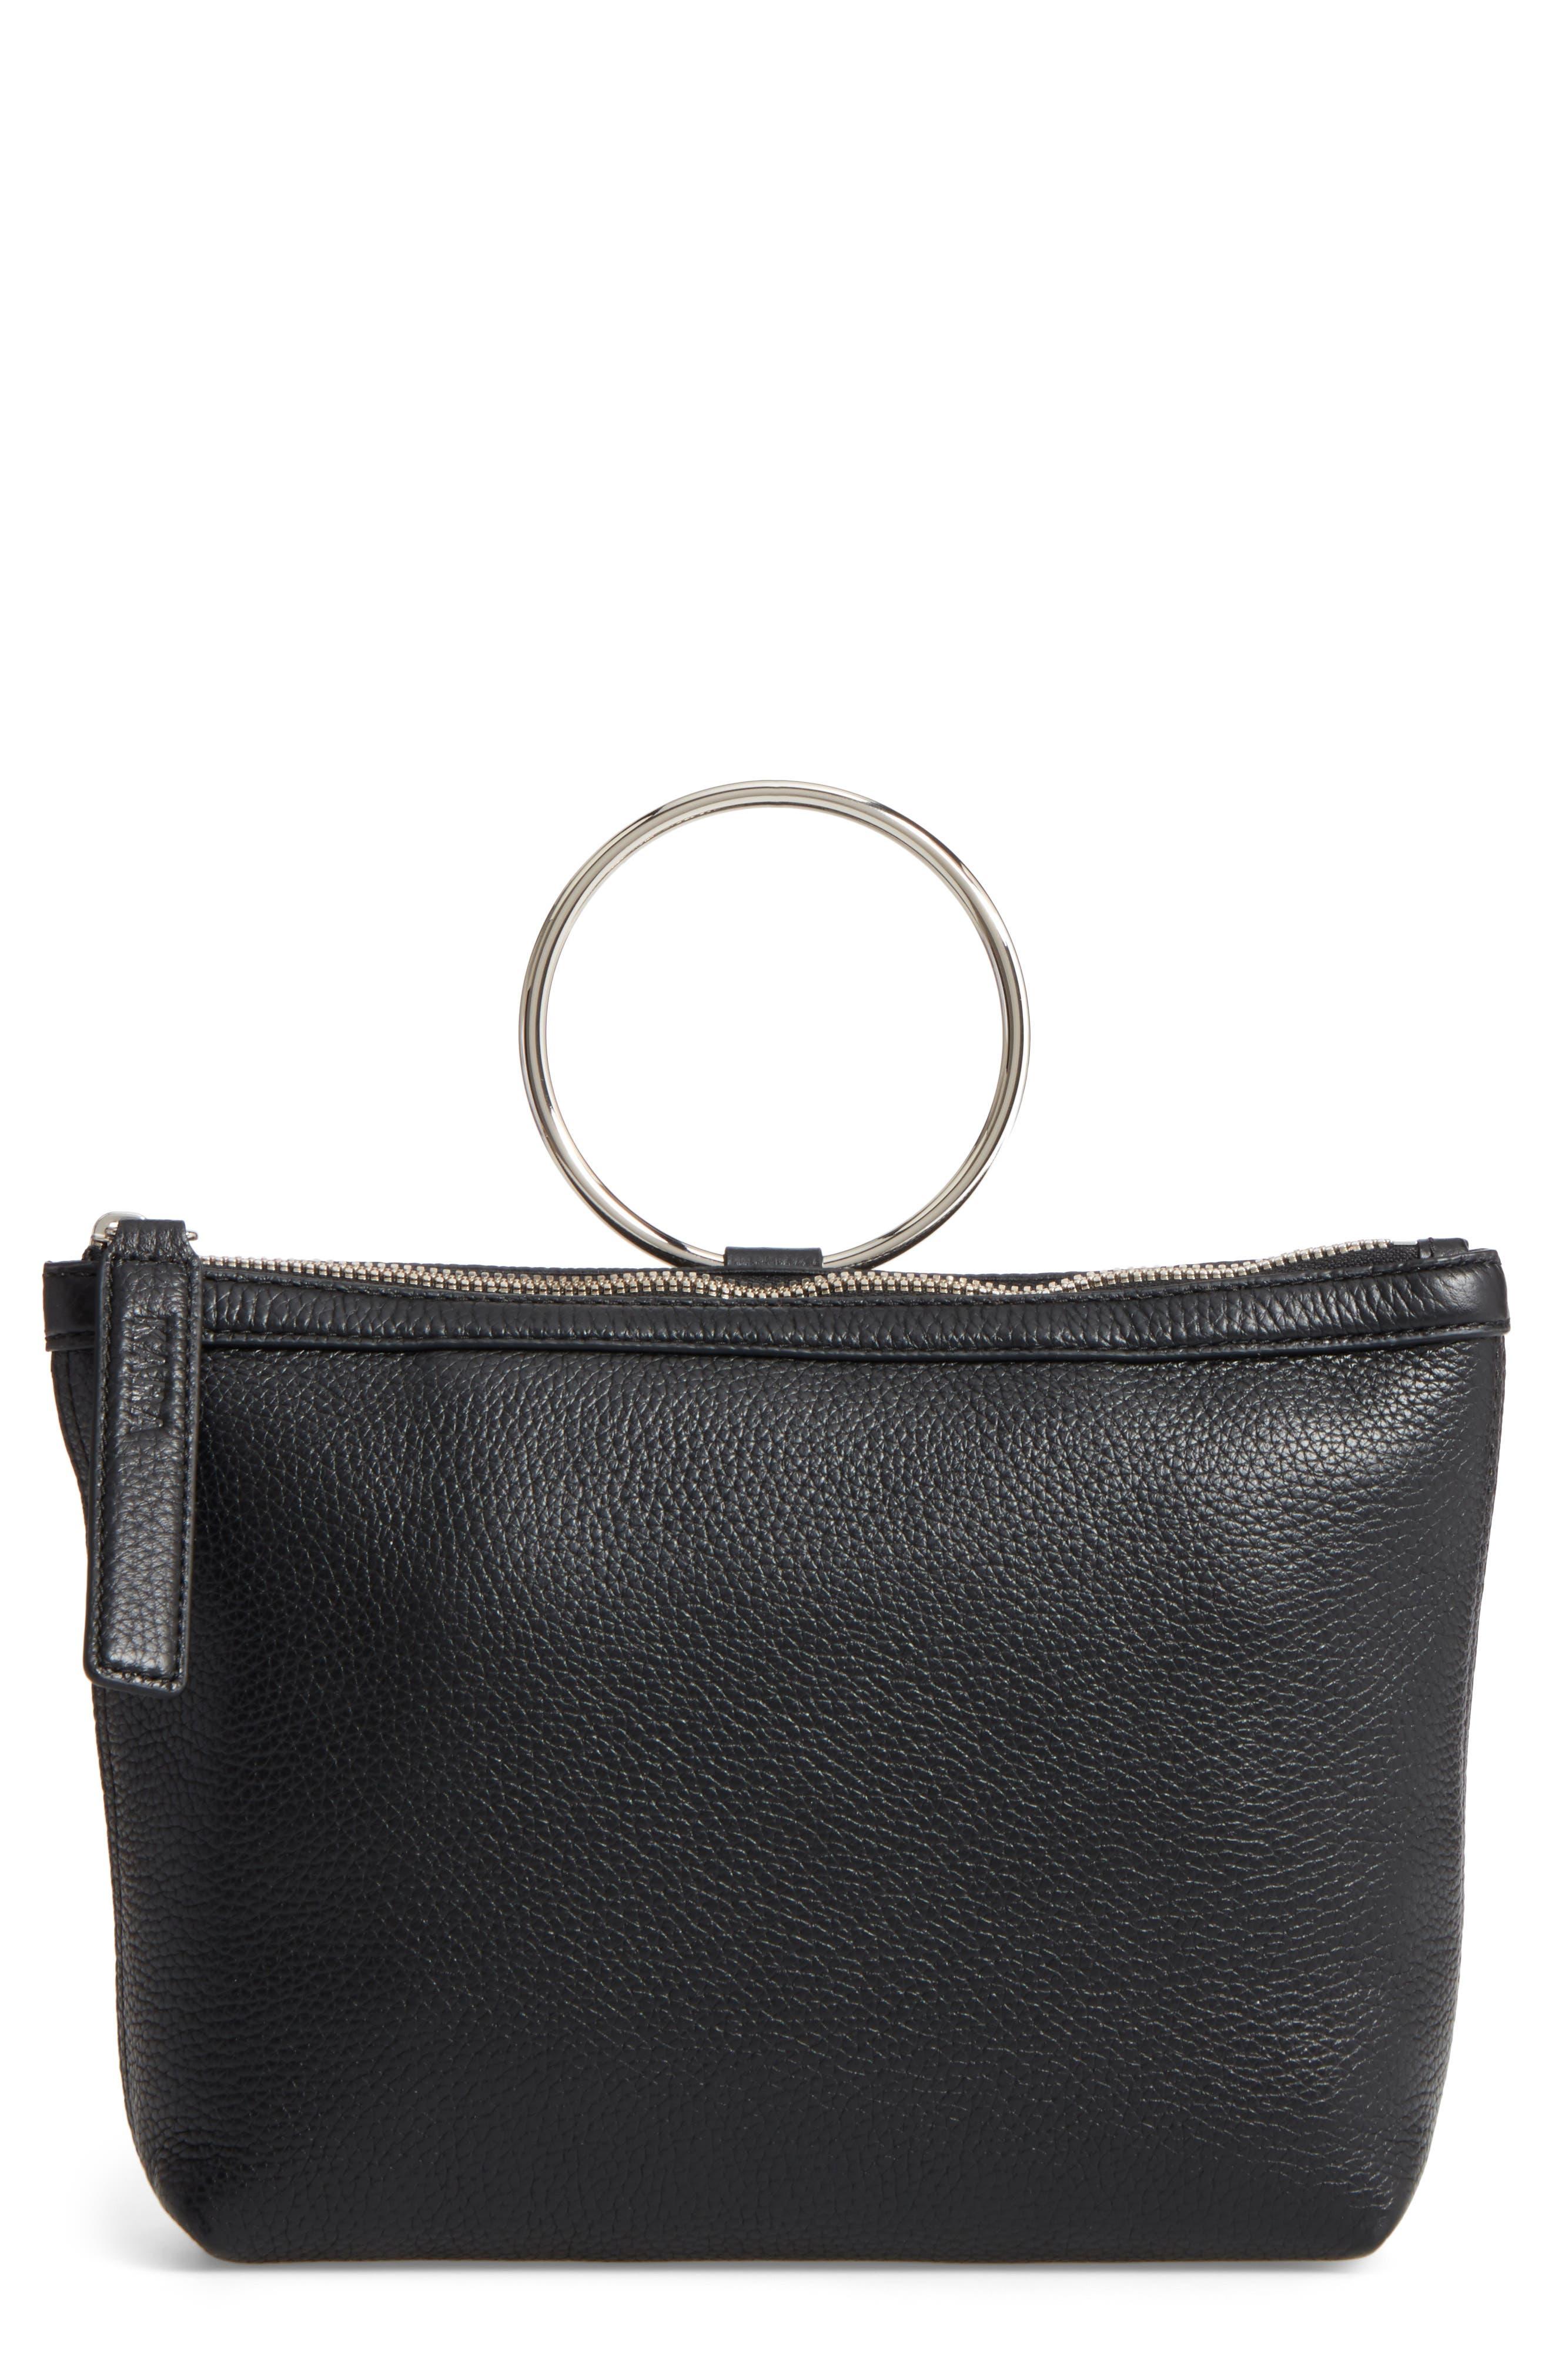 KARA Pebbled Leather Ring Clutch